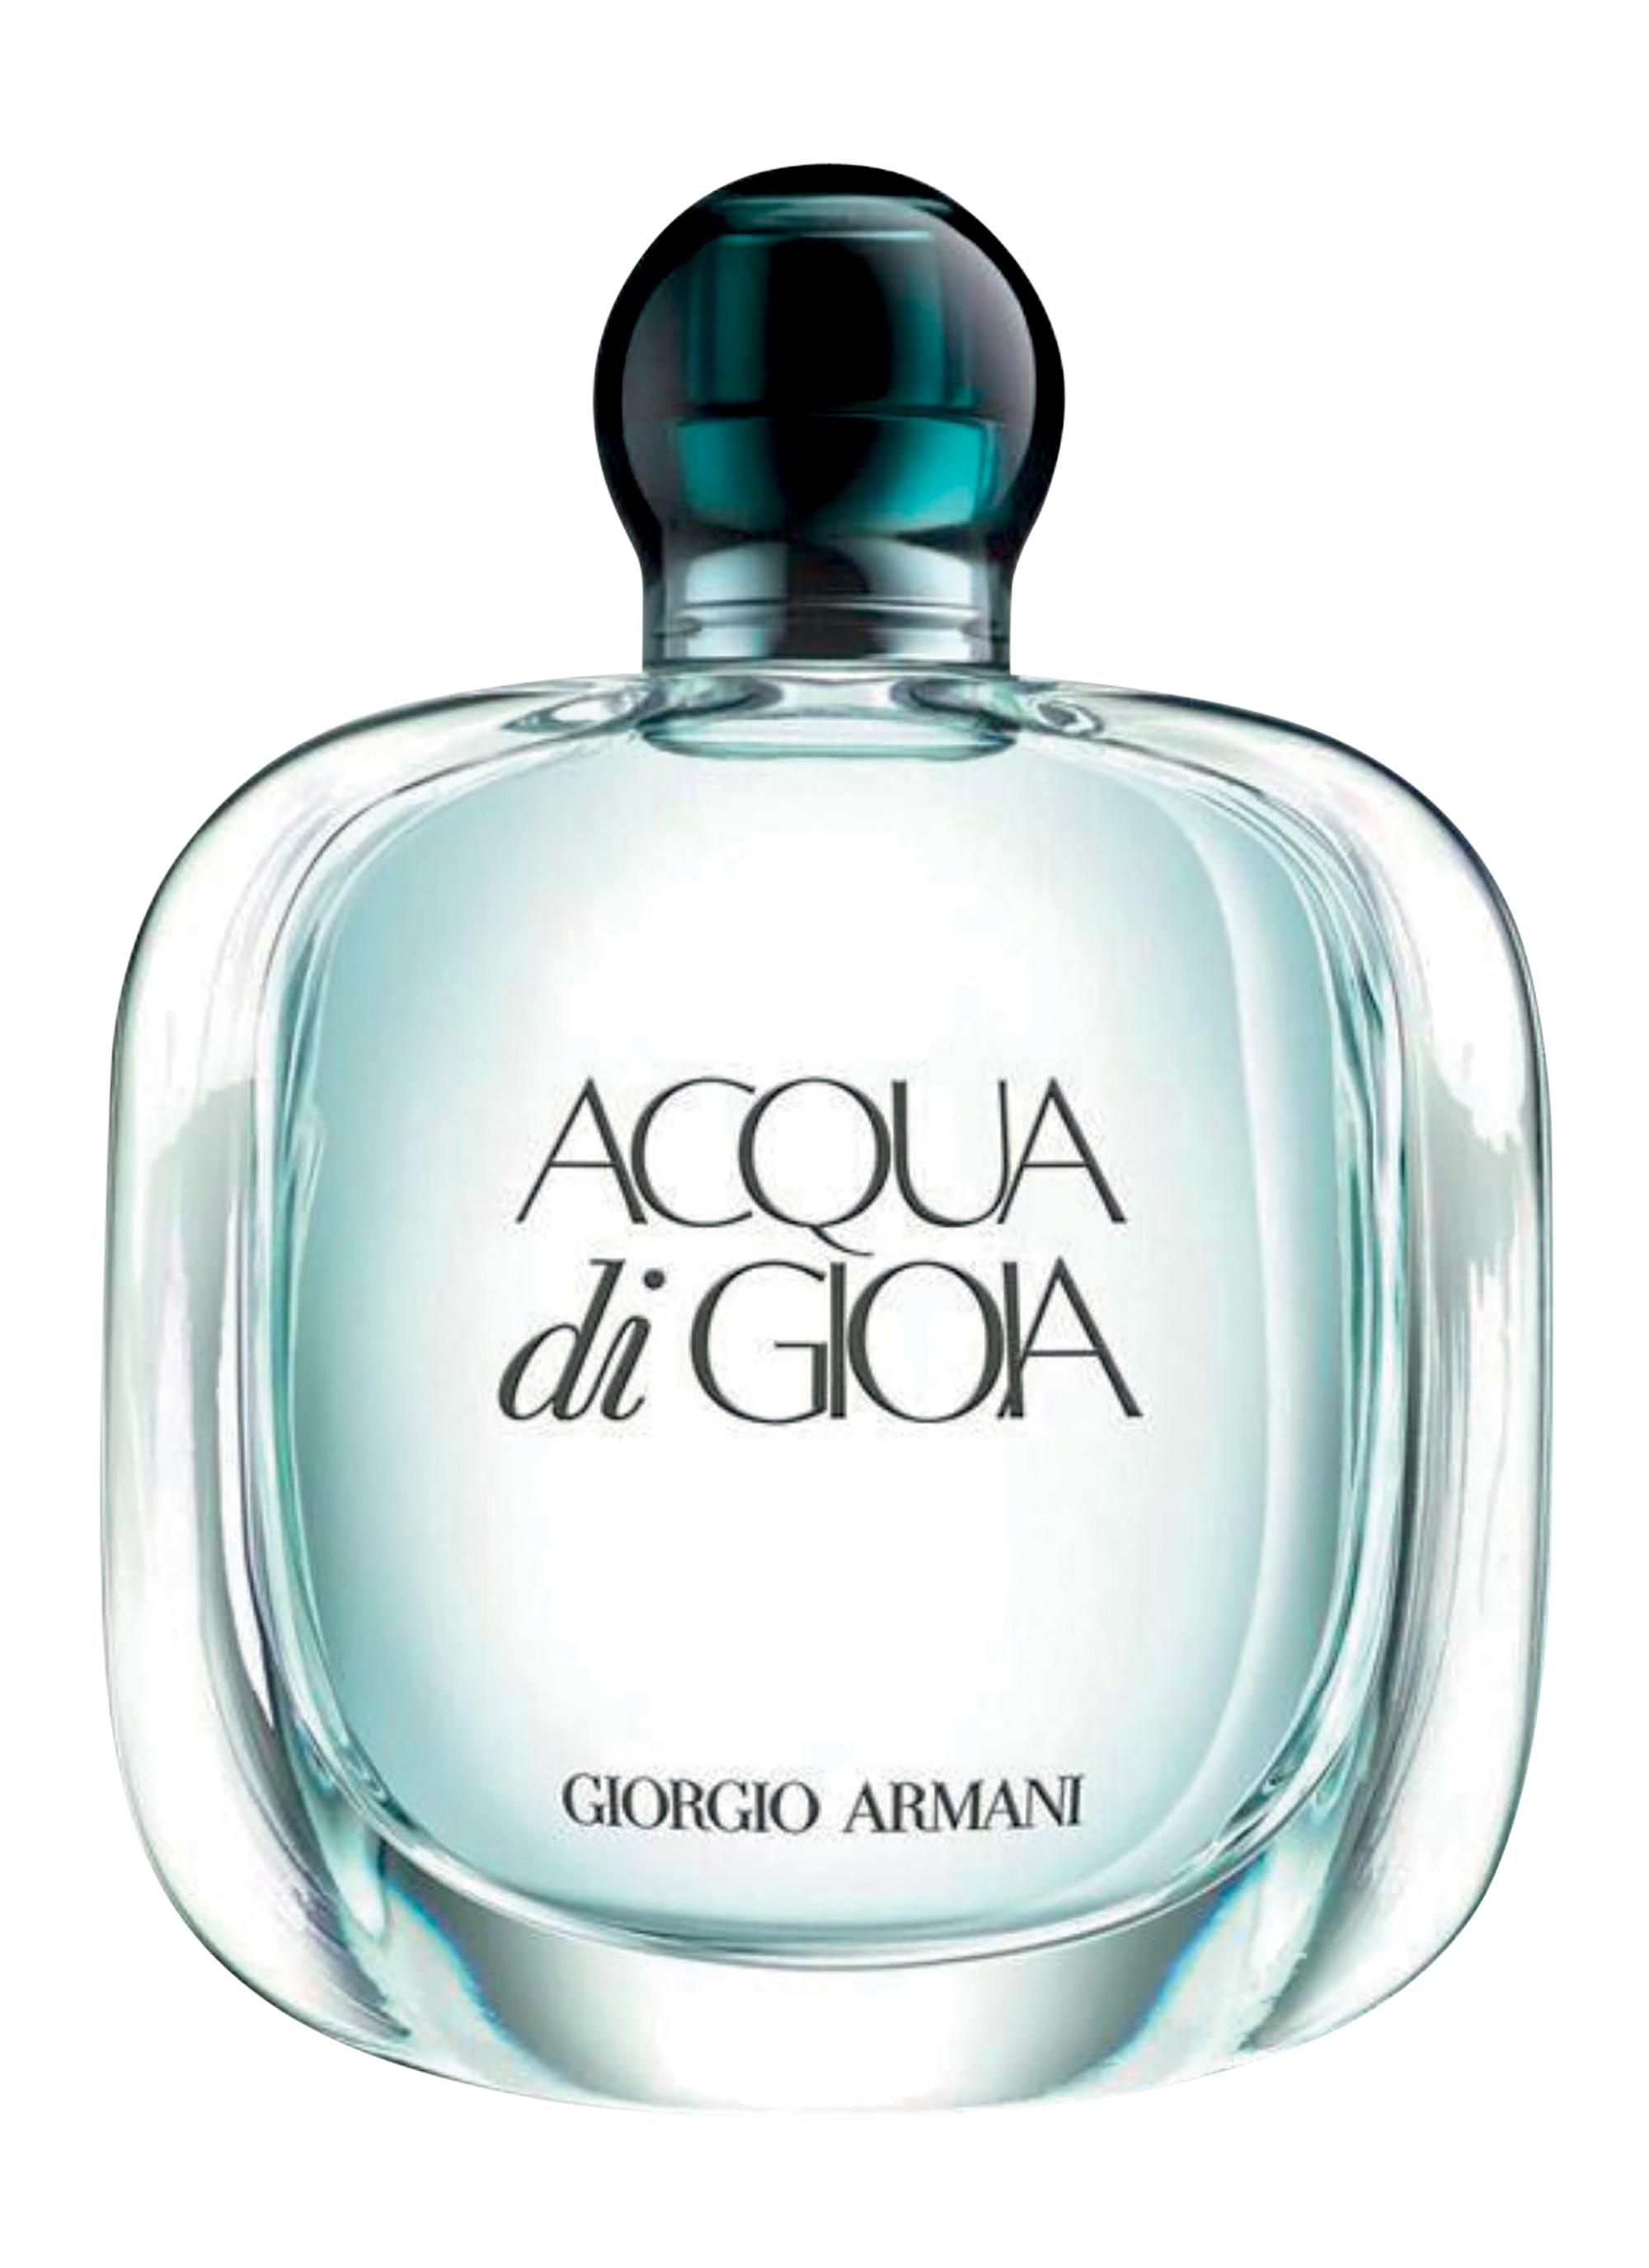 bạc hà nước hoa Acqua Di Giorgia Giorgio Armani